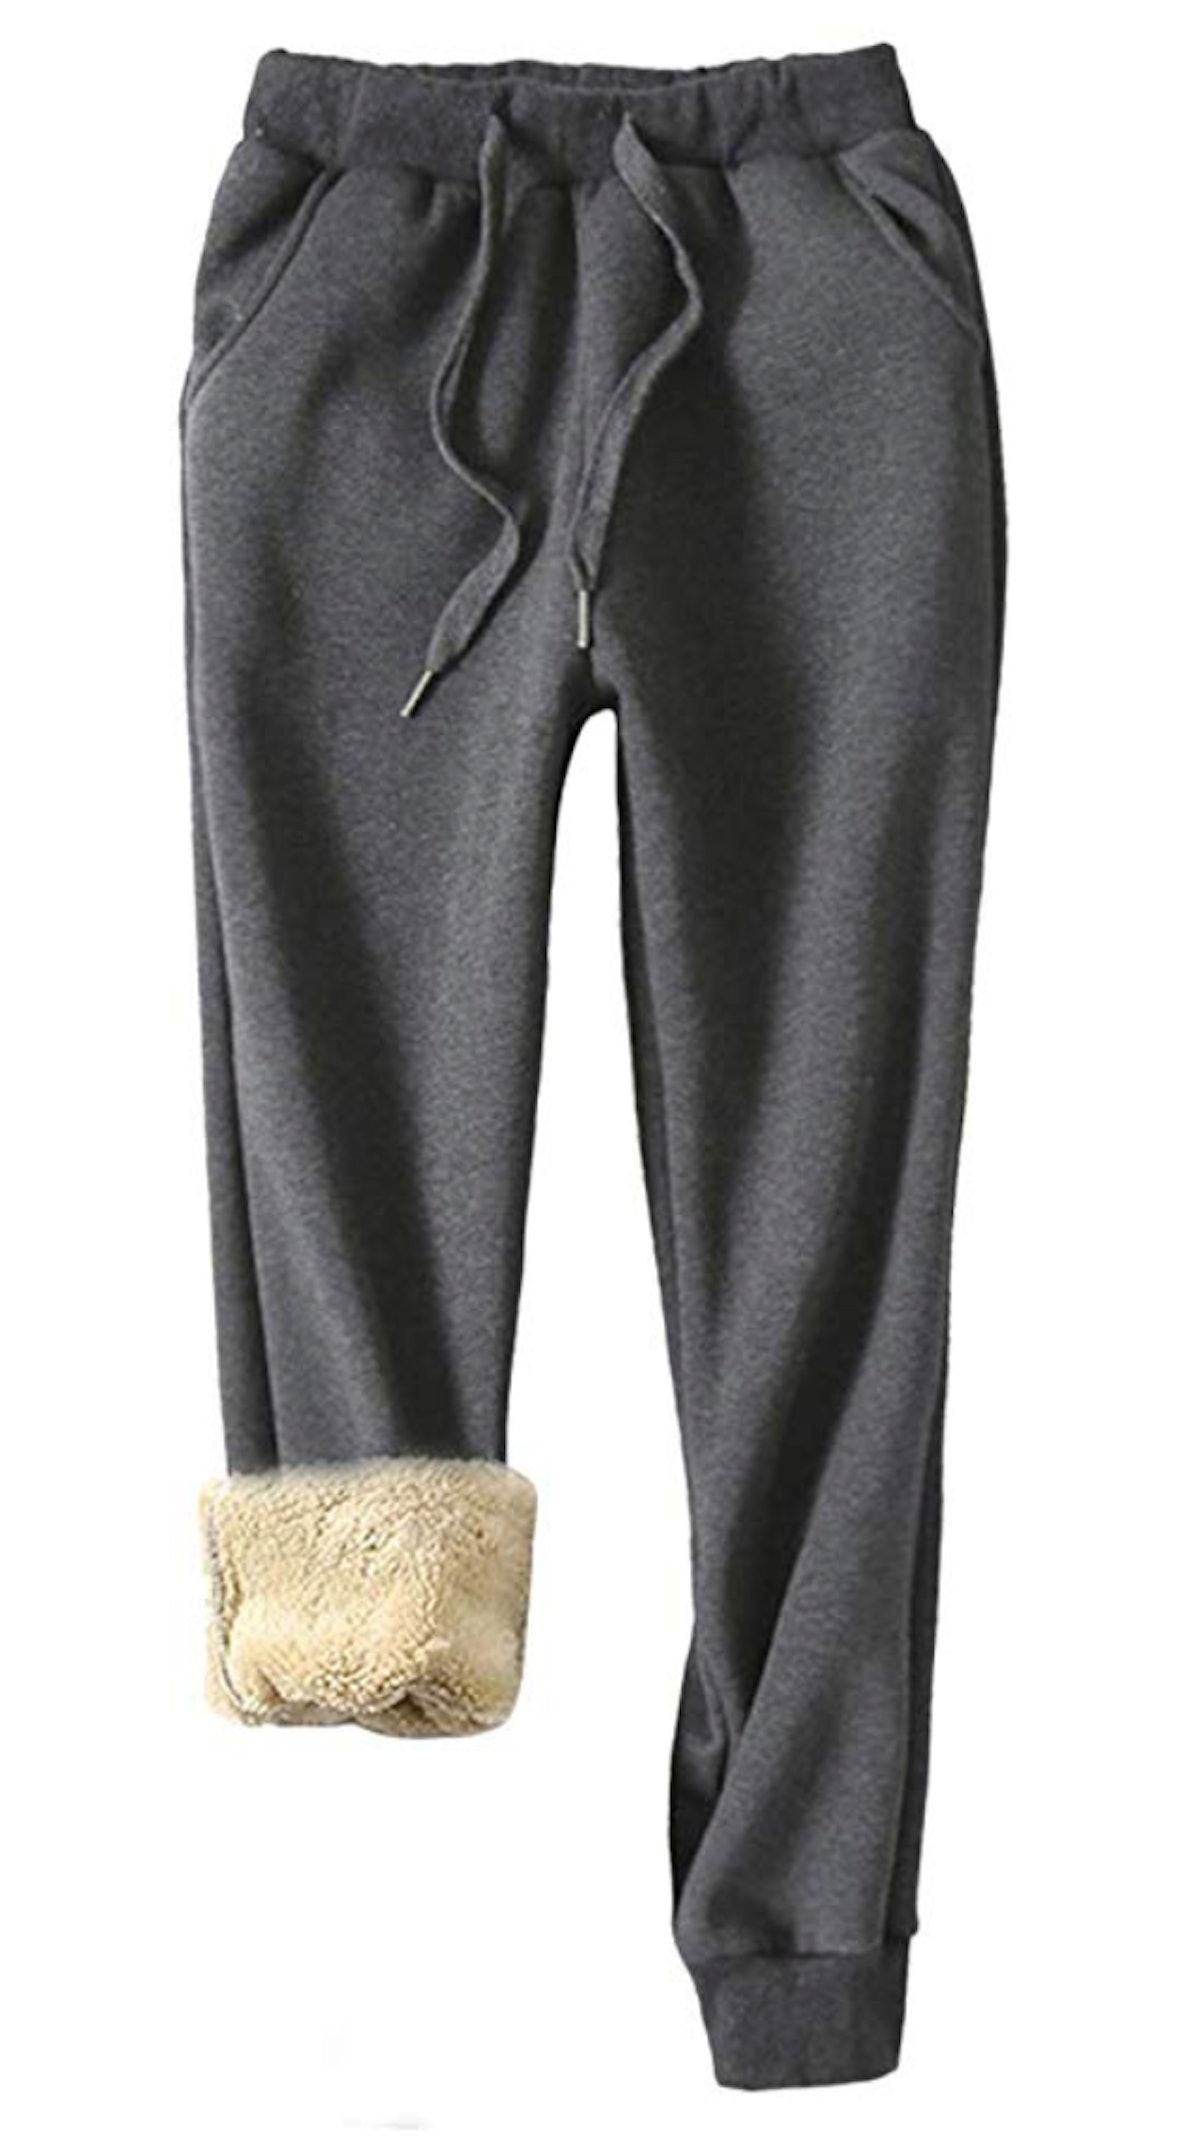 Yeokou Women's Warm Sherpa Lined Sweatpants